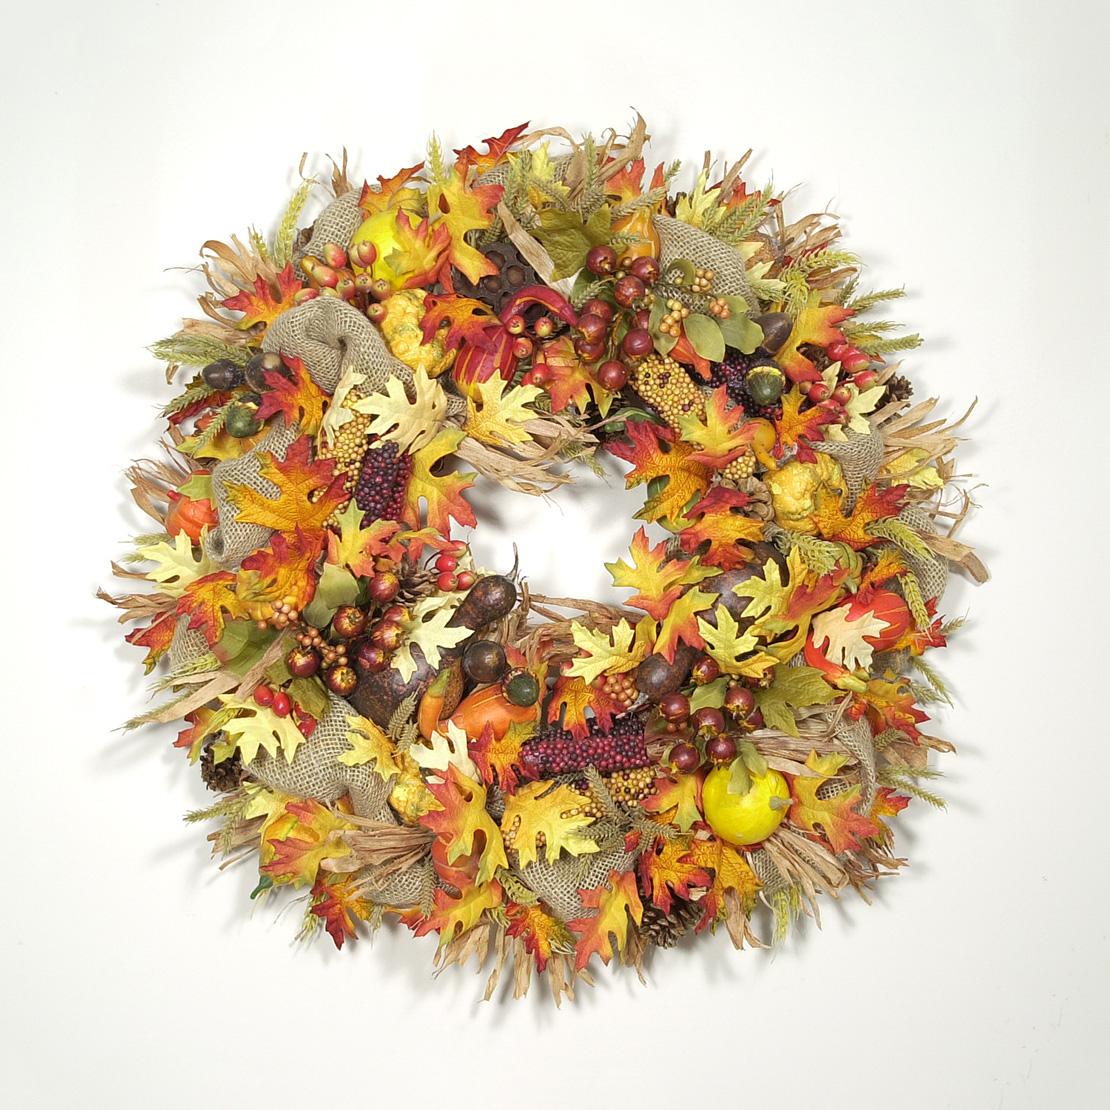 Autumn Harvest Burlap Wreath Wreaths Unlimited